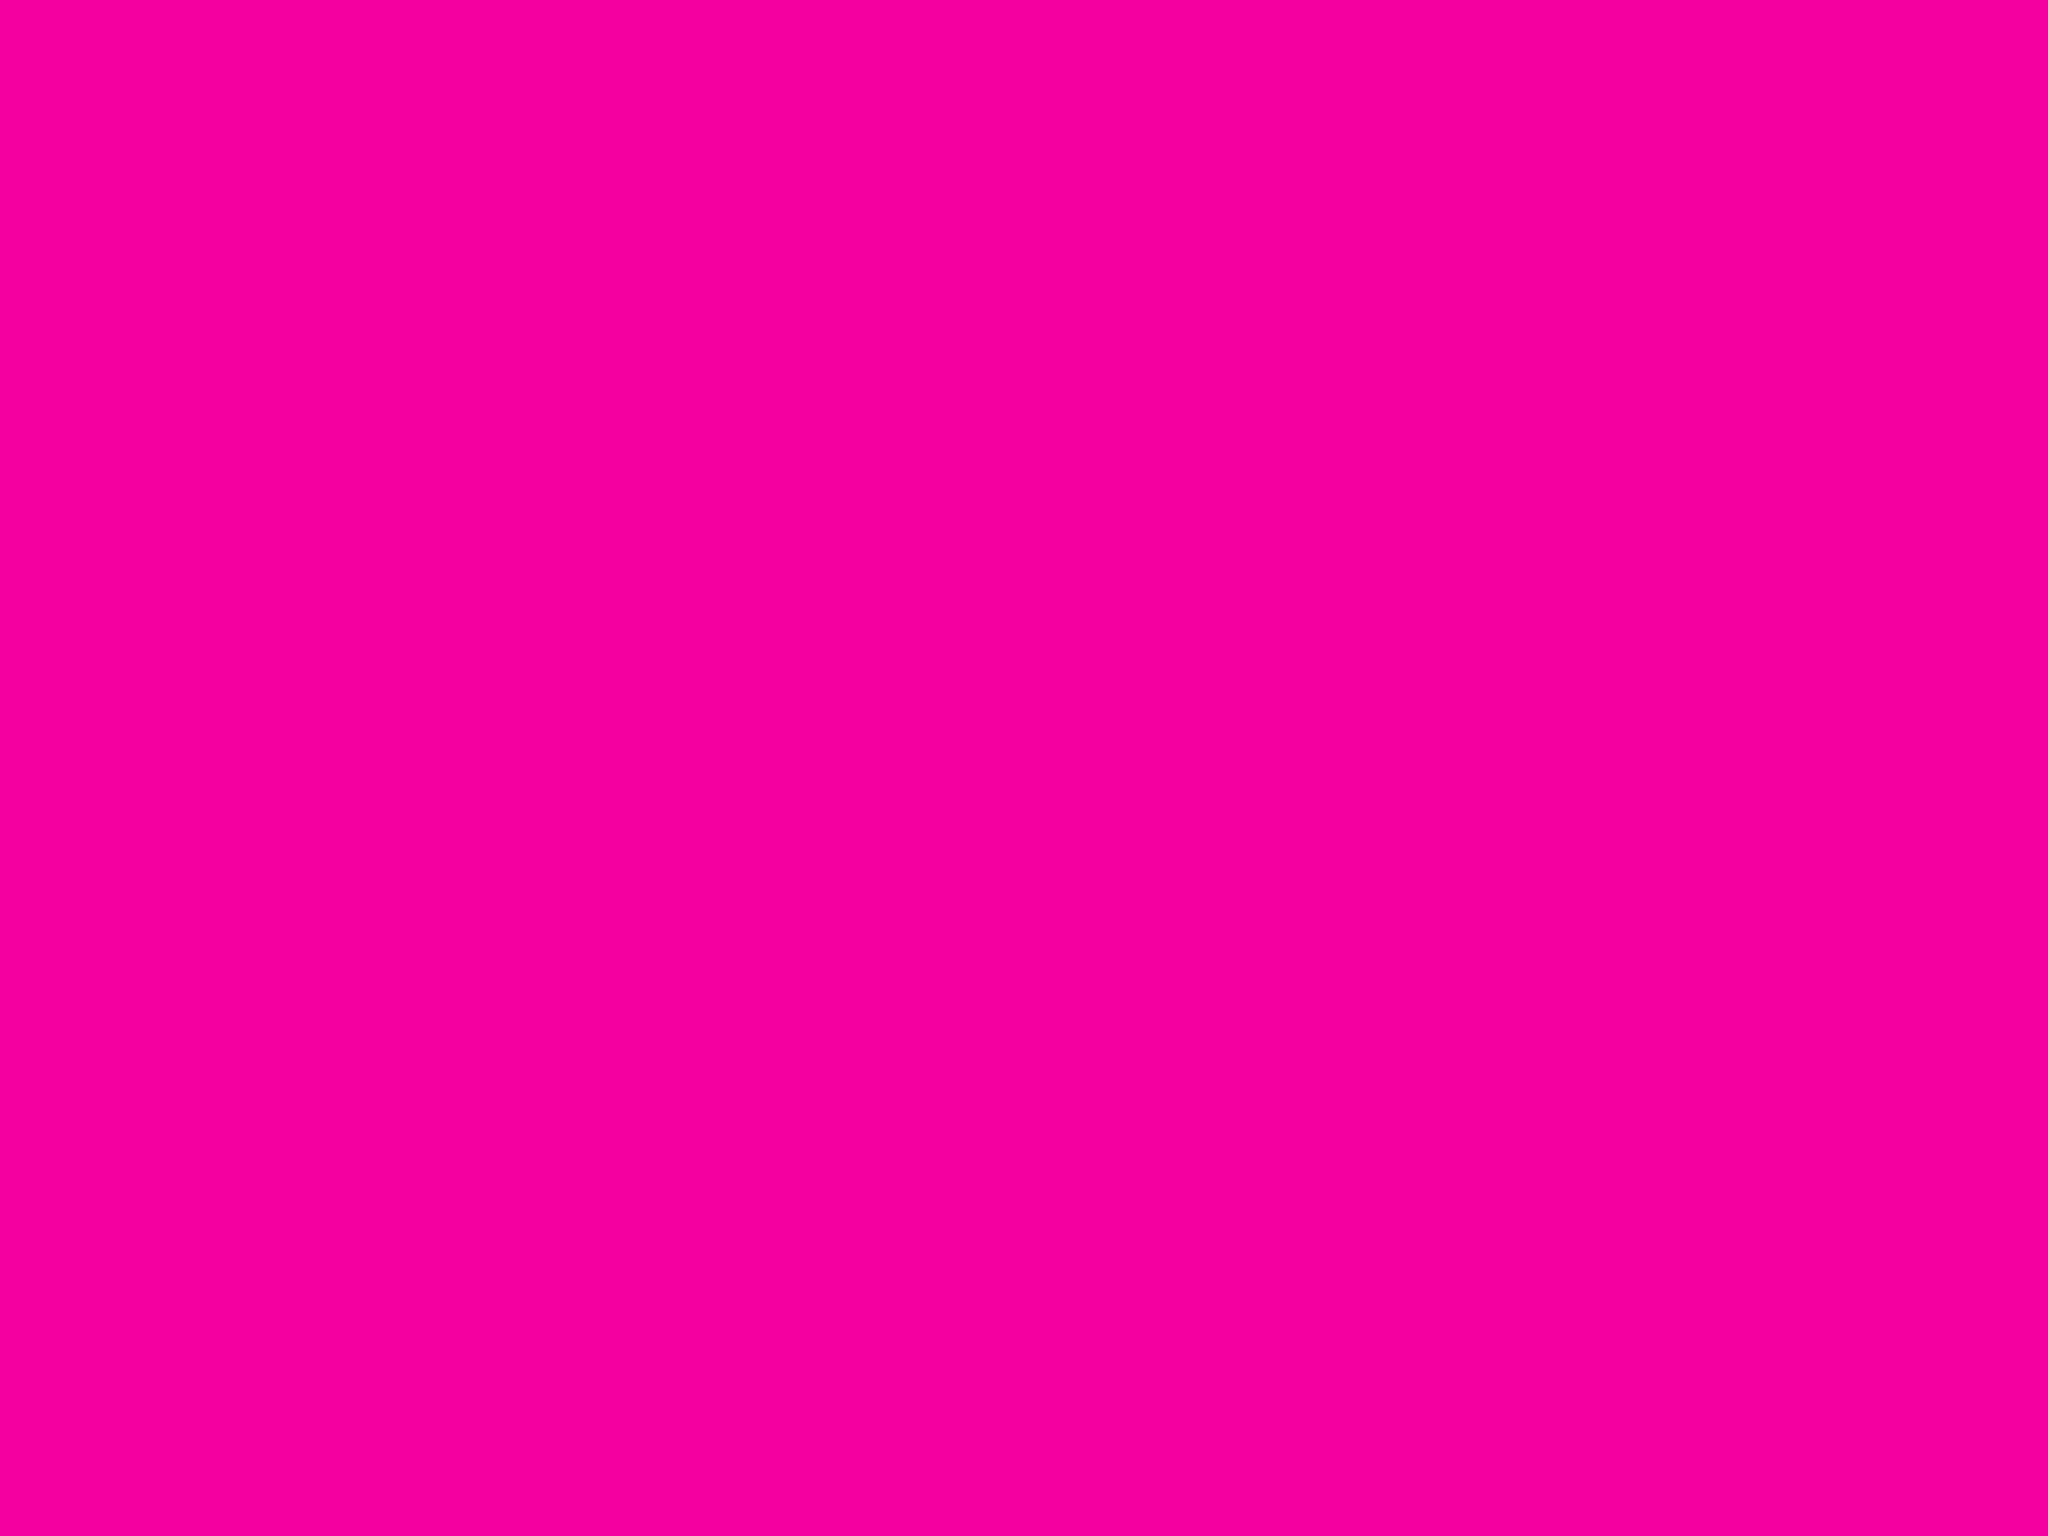 2048x1536 Fashion Fuchsia Solid Color Background